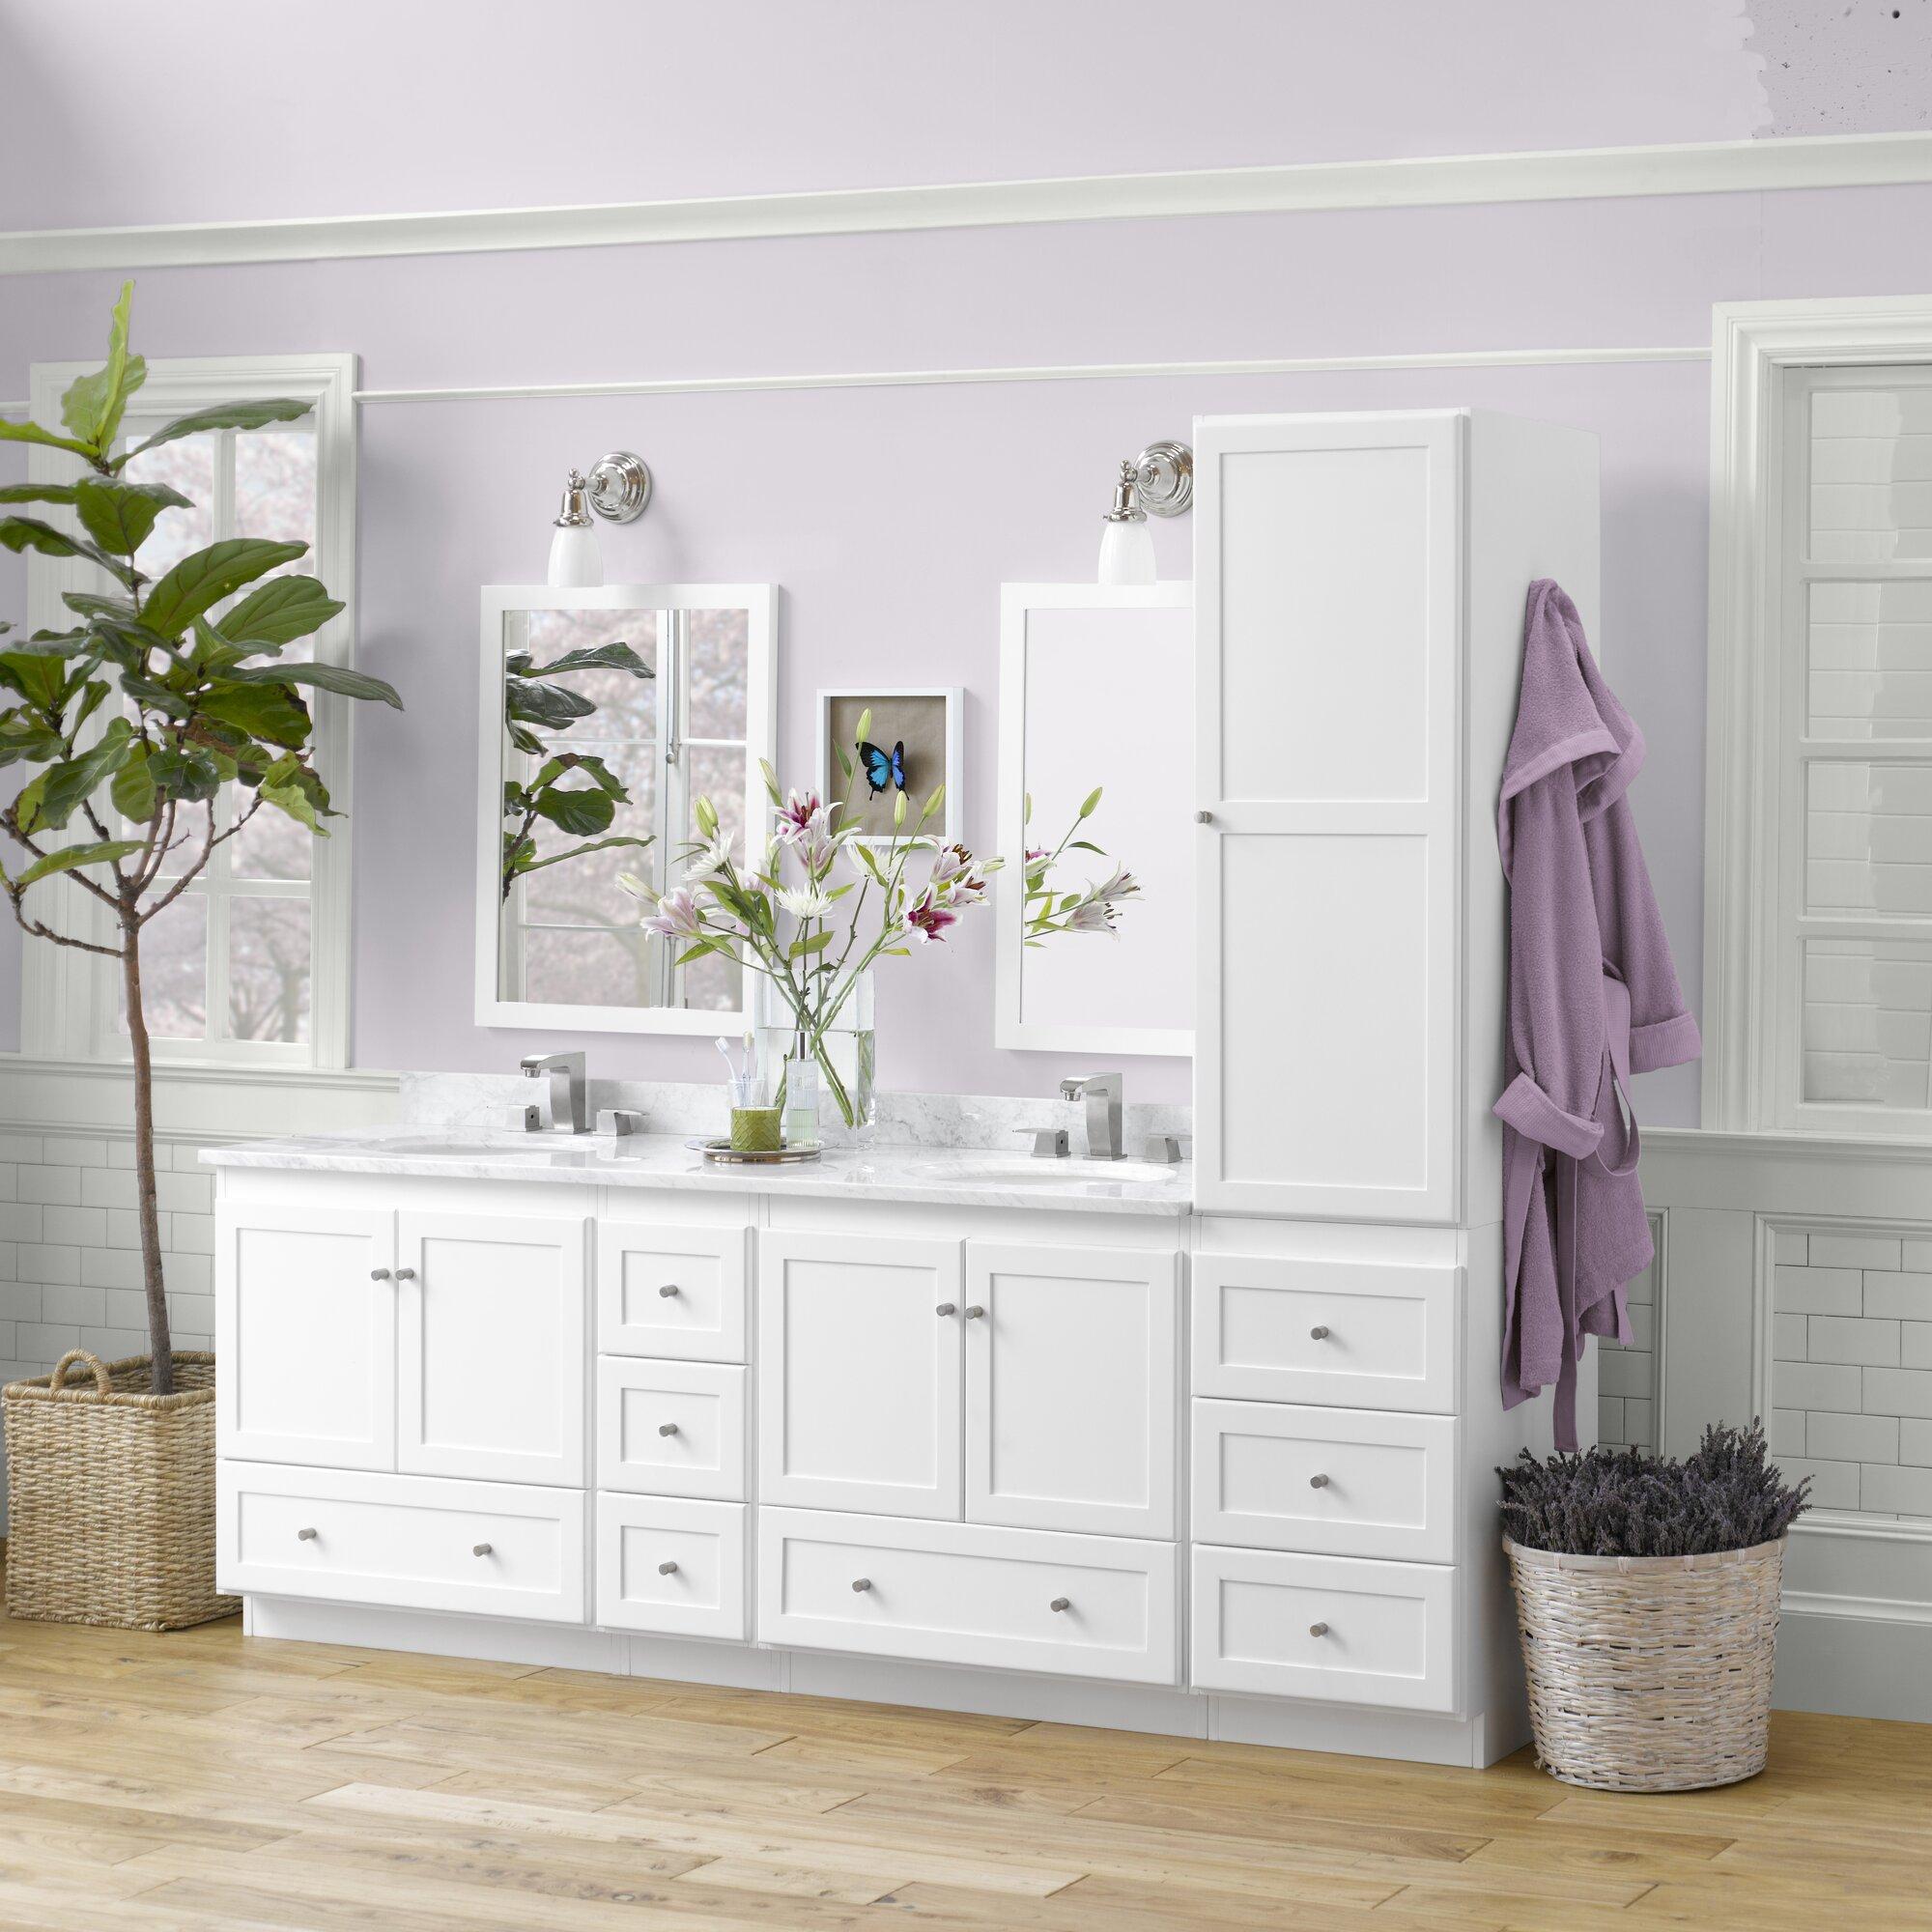 Double bathroom vanity - Shaker 90 Double Bathroom Vanity Set